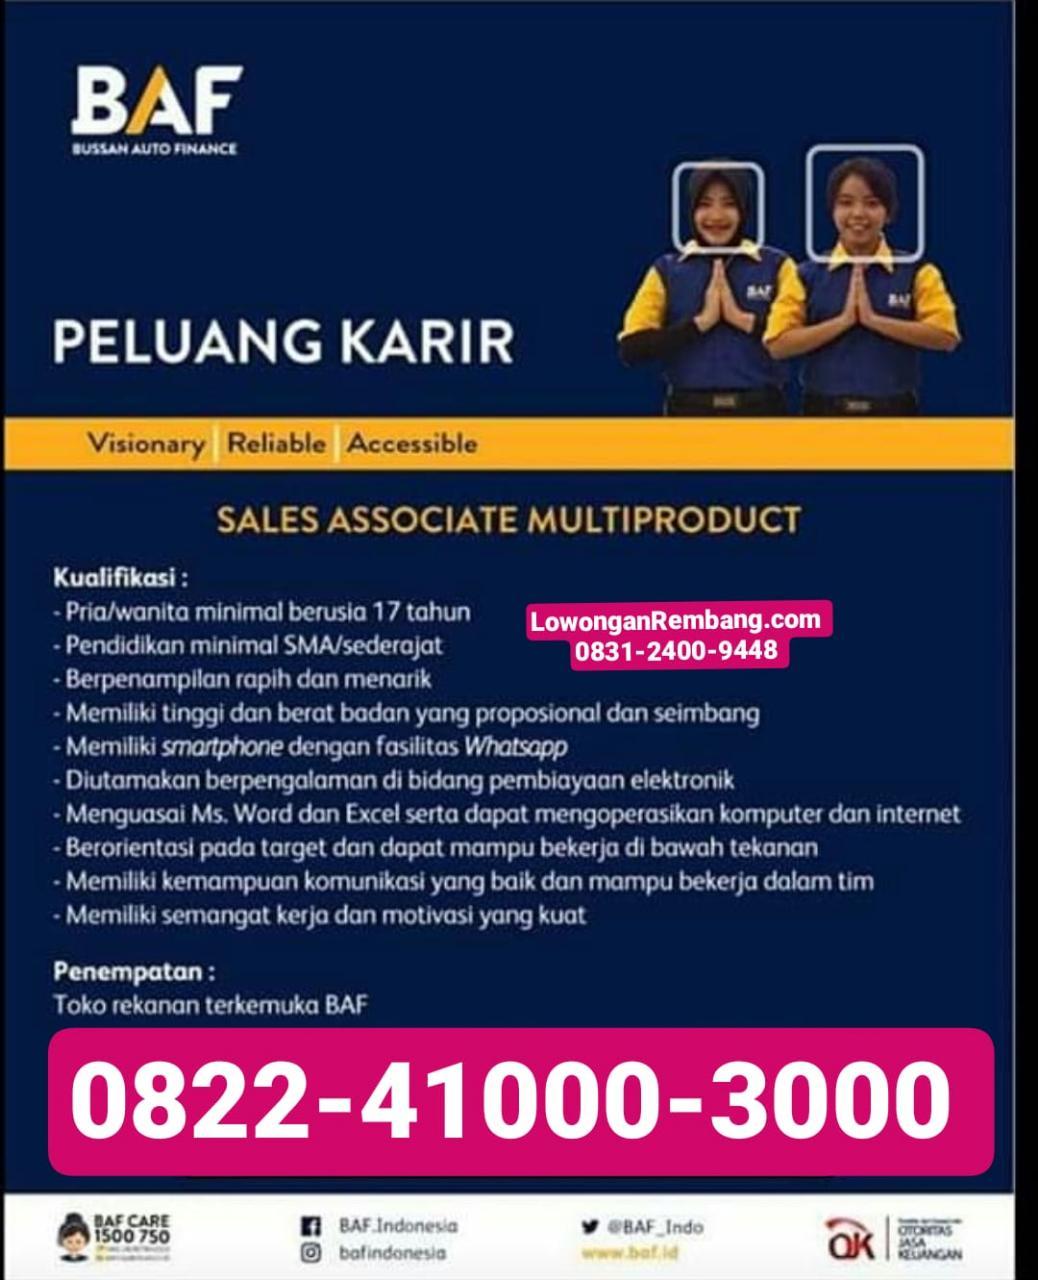 Lowongan Kerja Sales Associate Multiproduct BAF Finance Rembang